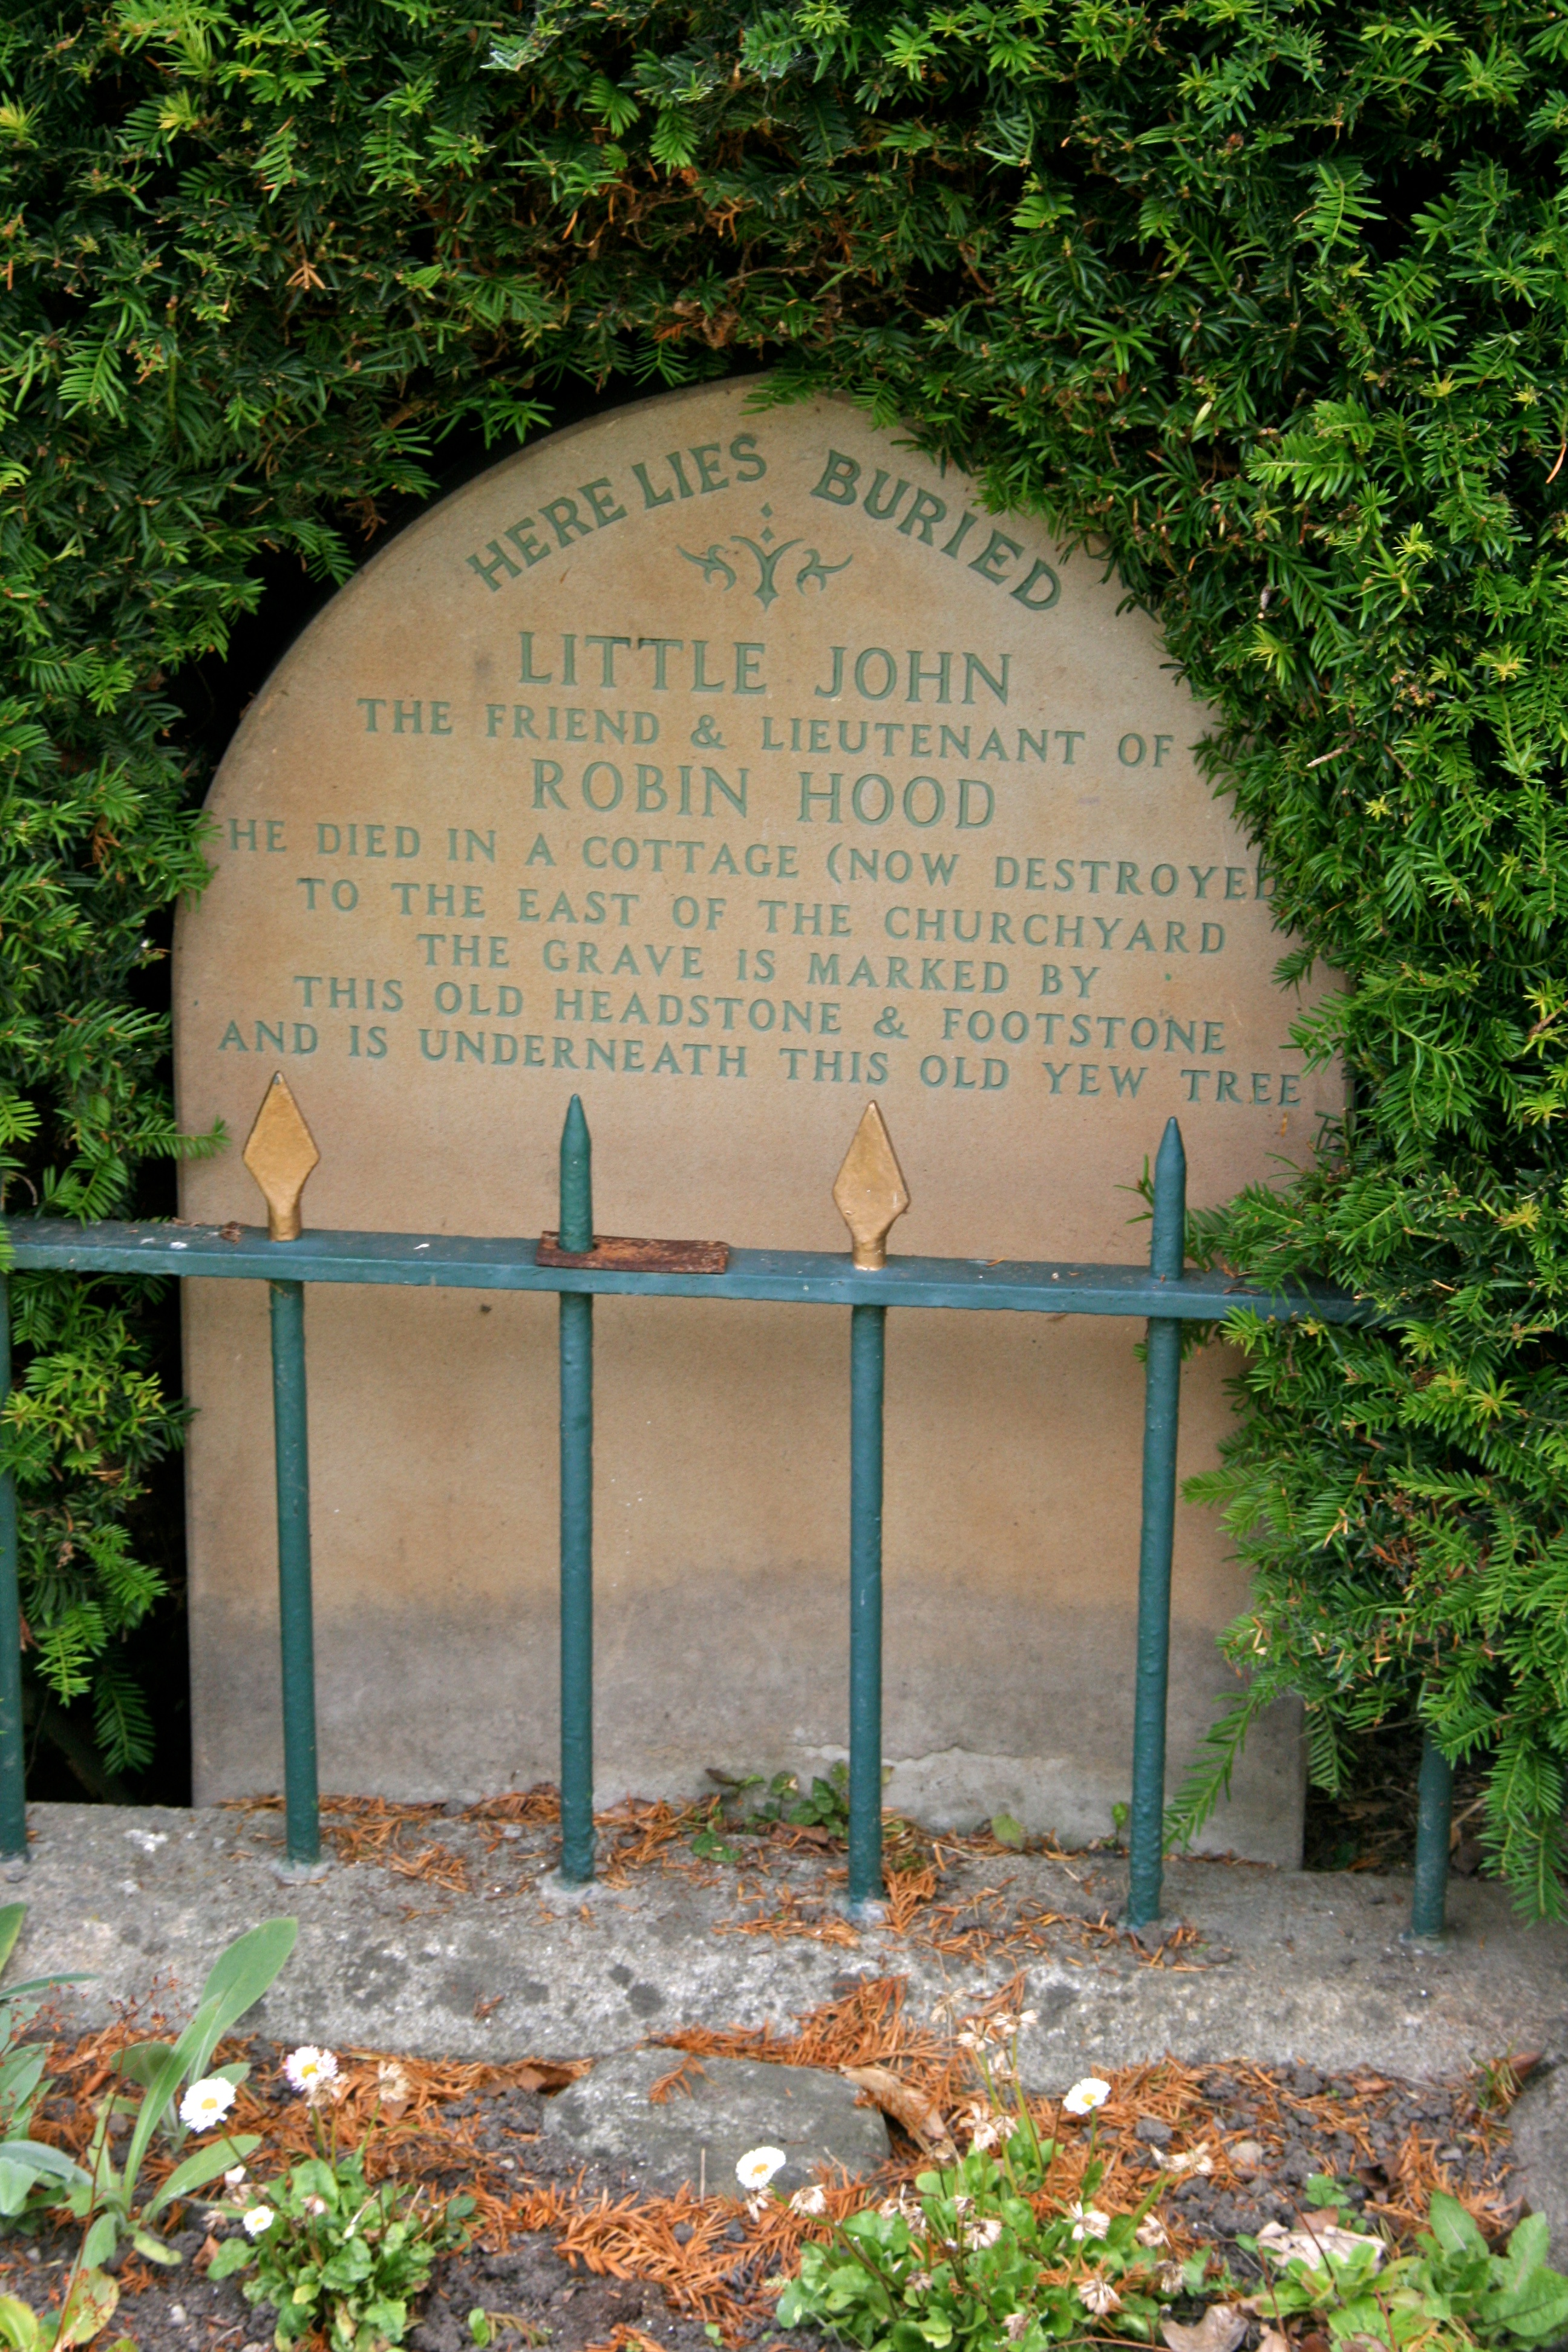 https://upload.wikimedia.org/wikipedia/commons/4/4d/Little_John%27s_Grave%2C_Hathersage_1.jpg